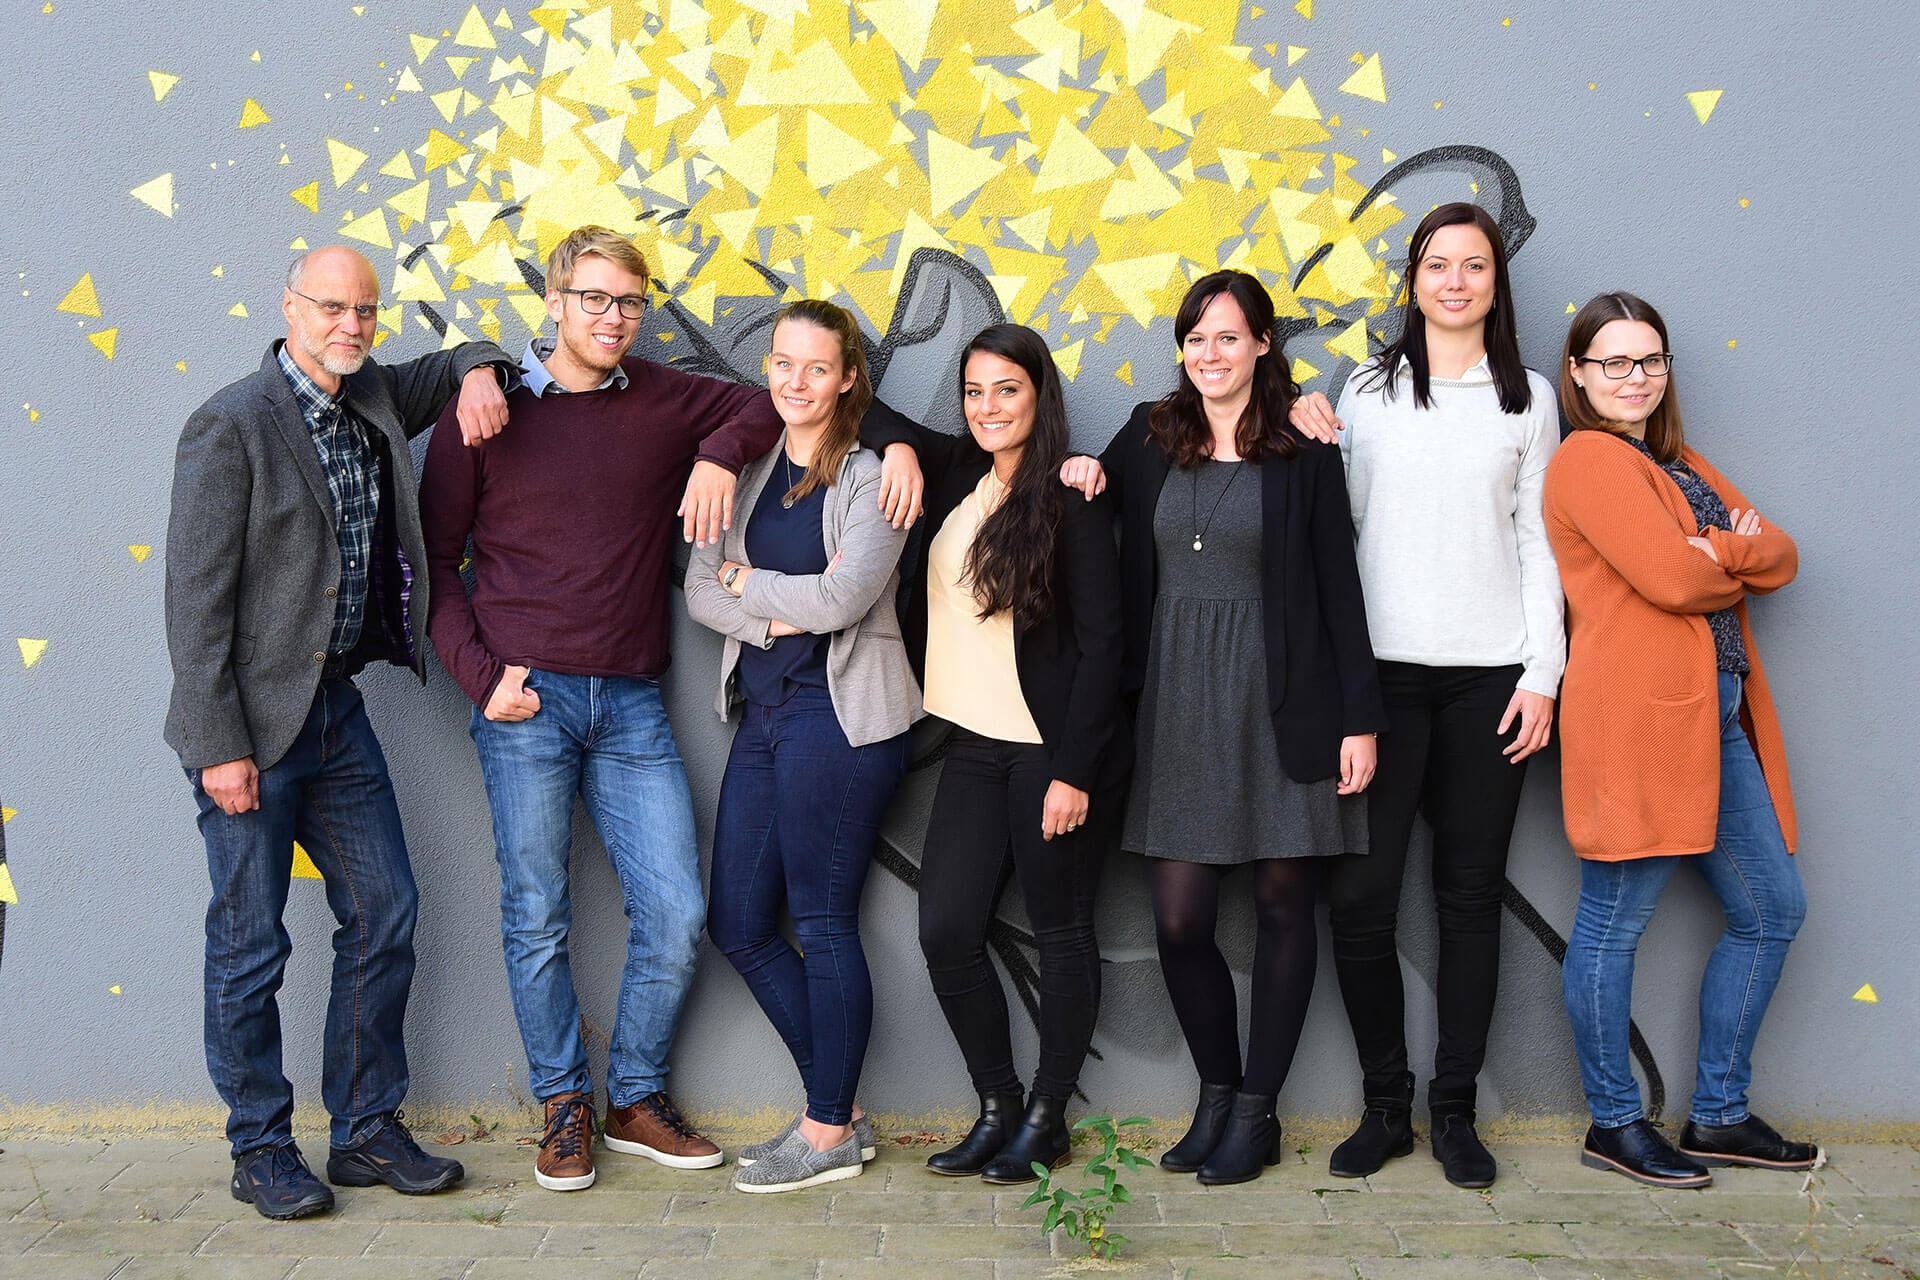 schulportrait-seminarschule-content-sozialkunde-18-19-2